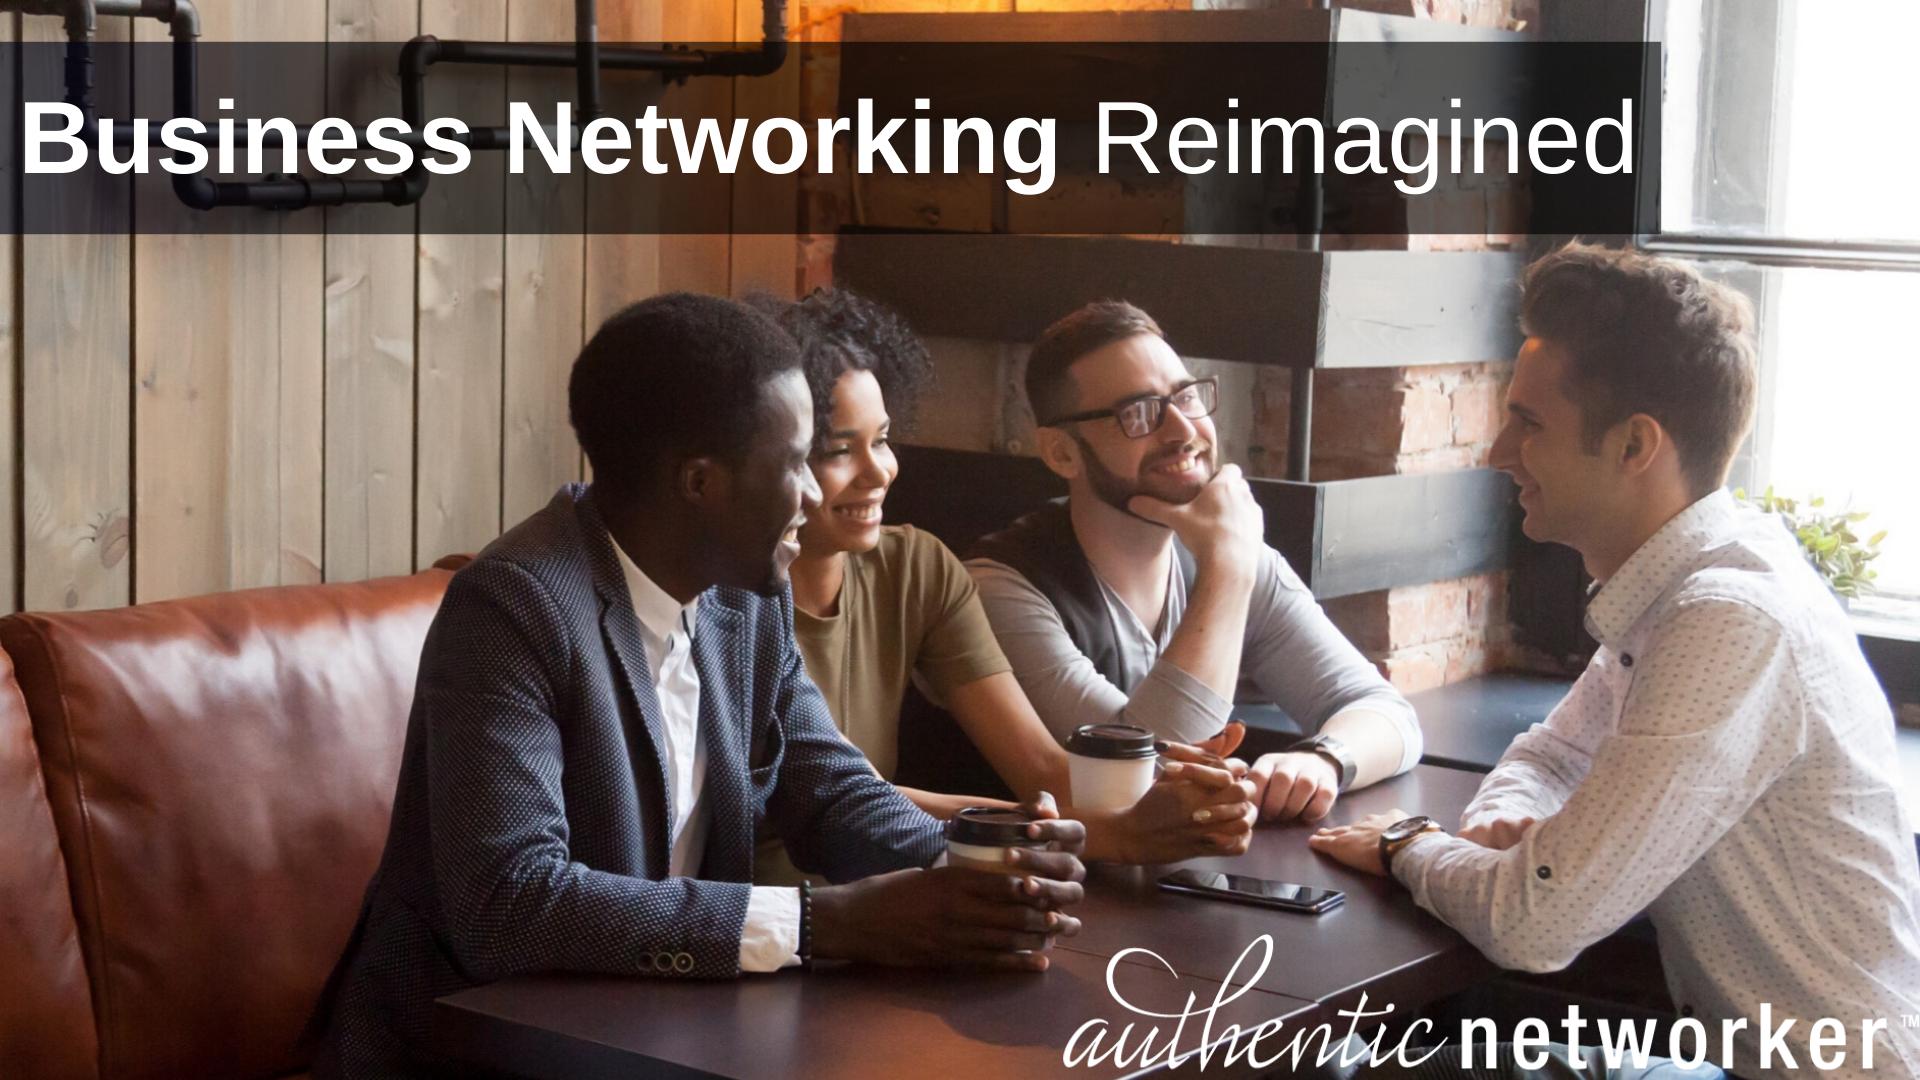 Business Networking Reimagined - DMV